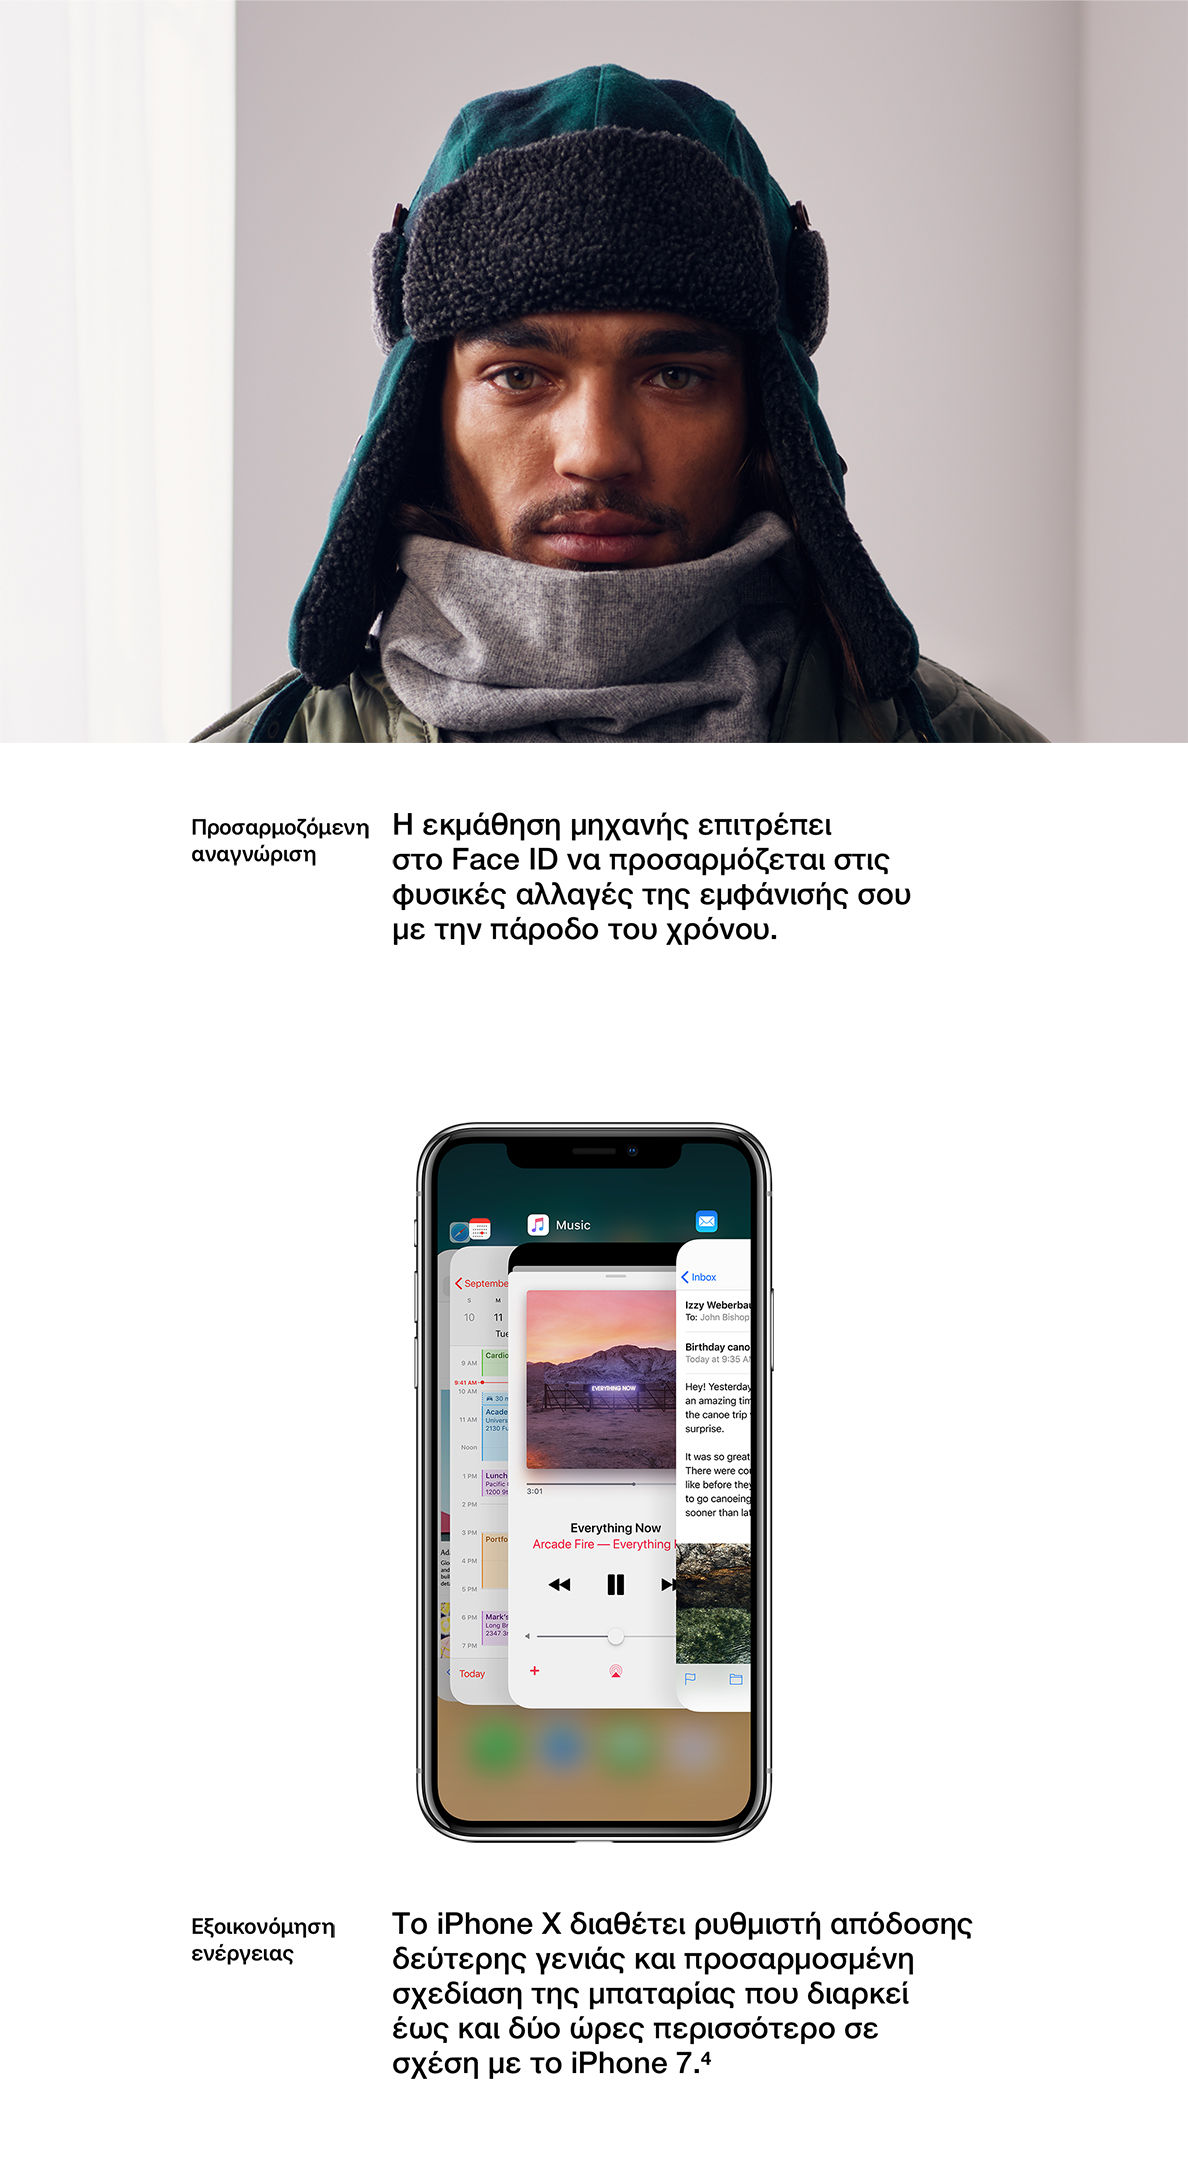 iPhonex-agora-Ellada-Mediamarkt-public-kotsovolos-germanos-iPhoneX-diathesimo-gia-paraggelia-november-2017 (11)